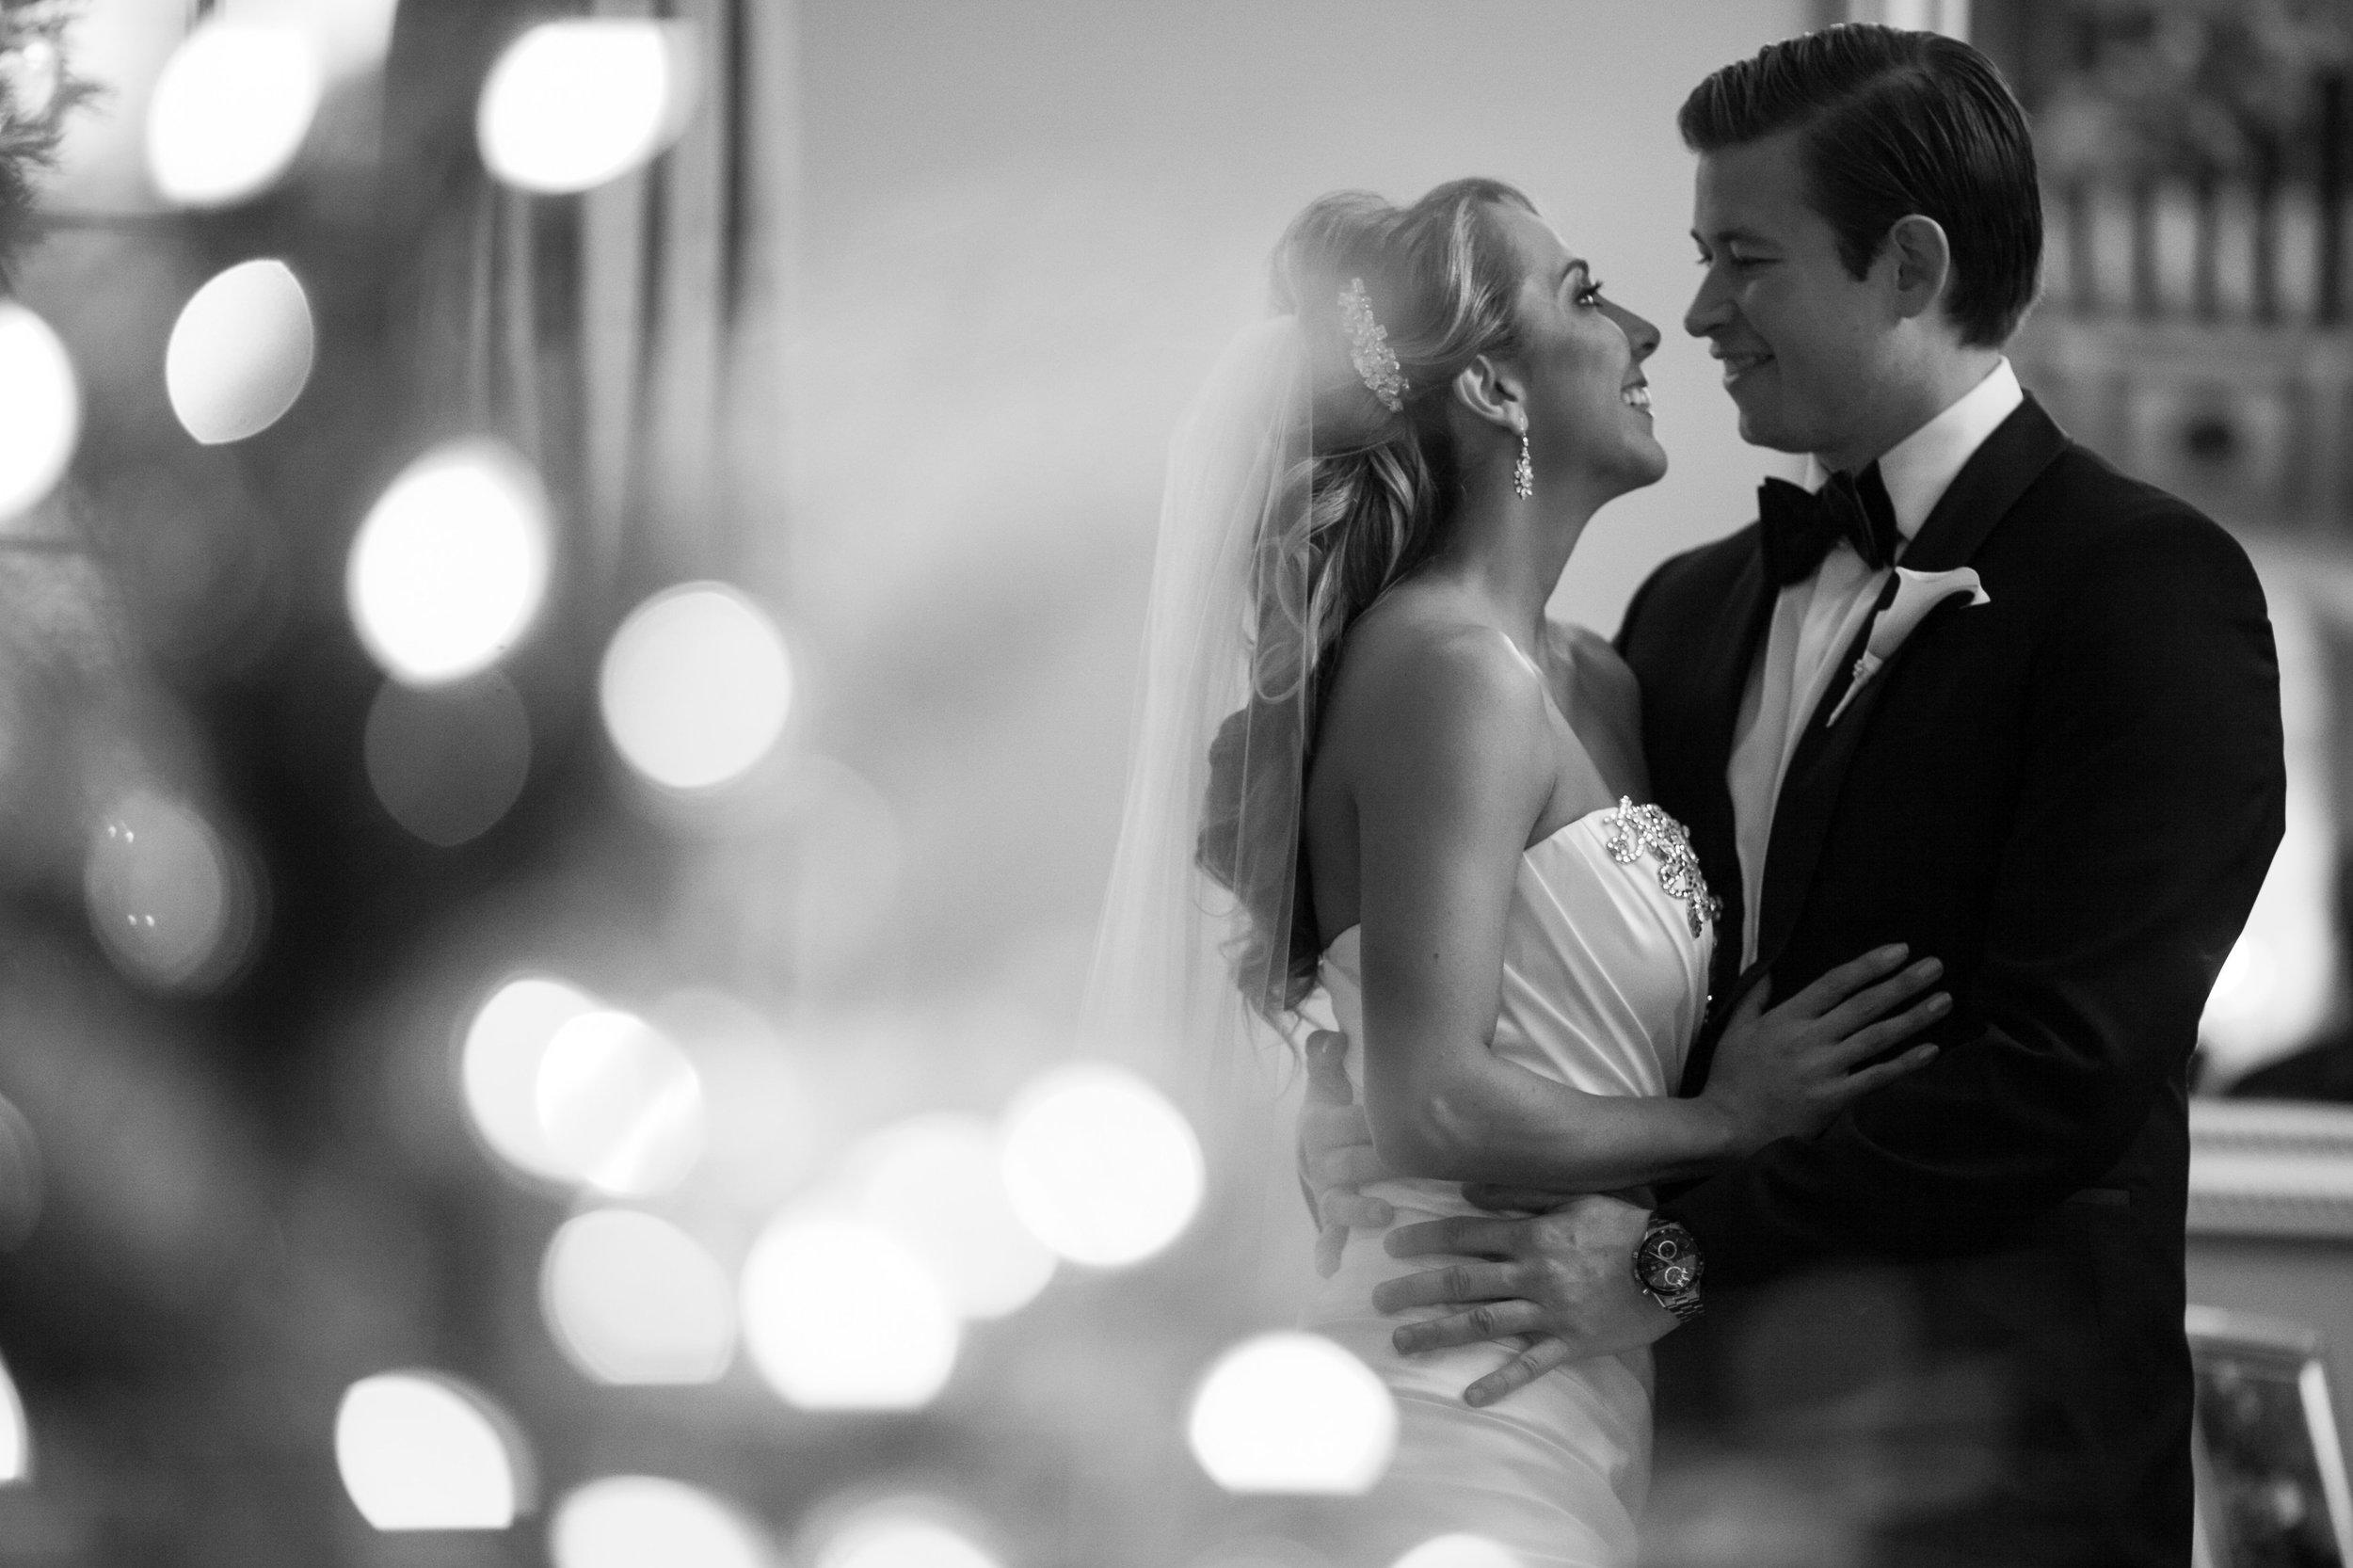 Ceci_New_York_Custom_Invitation_ New_Jersey_Wedding_Luxury_Personalized_Ceci_Style_Bride_Foil_Stamping150.JPG